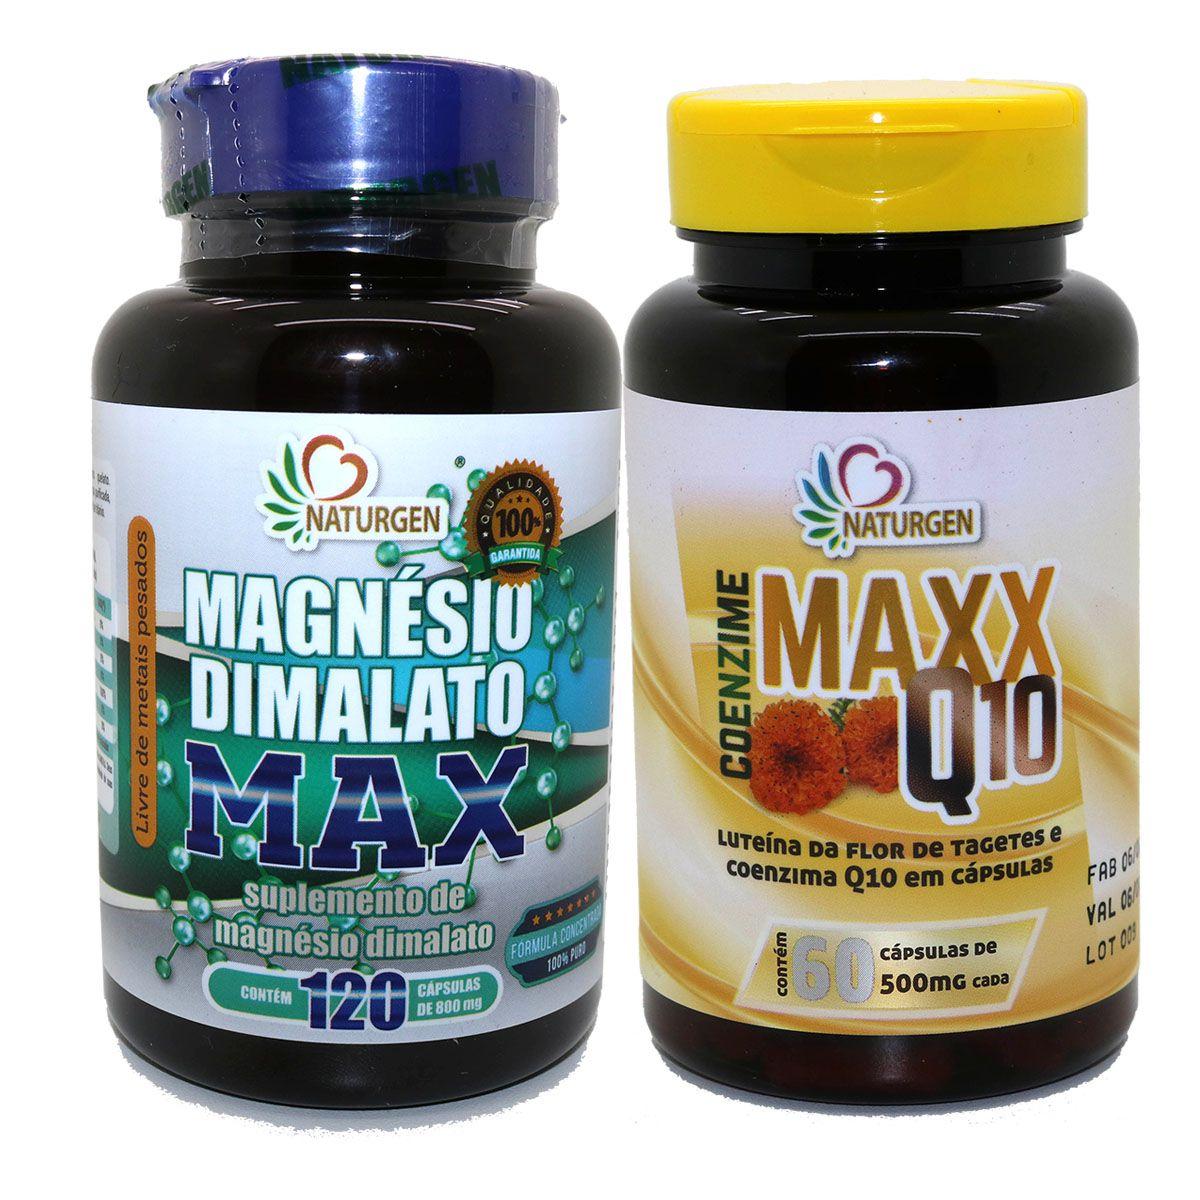 Magnesio Dimalato Coenzima Q10 Luteina Zeaxantina